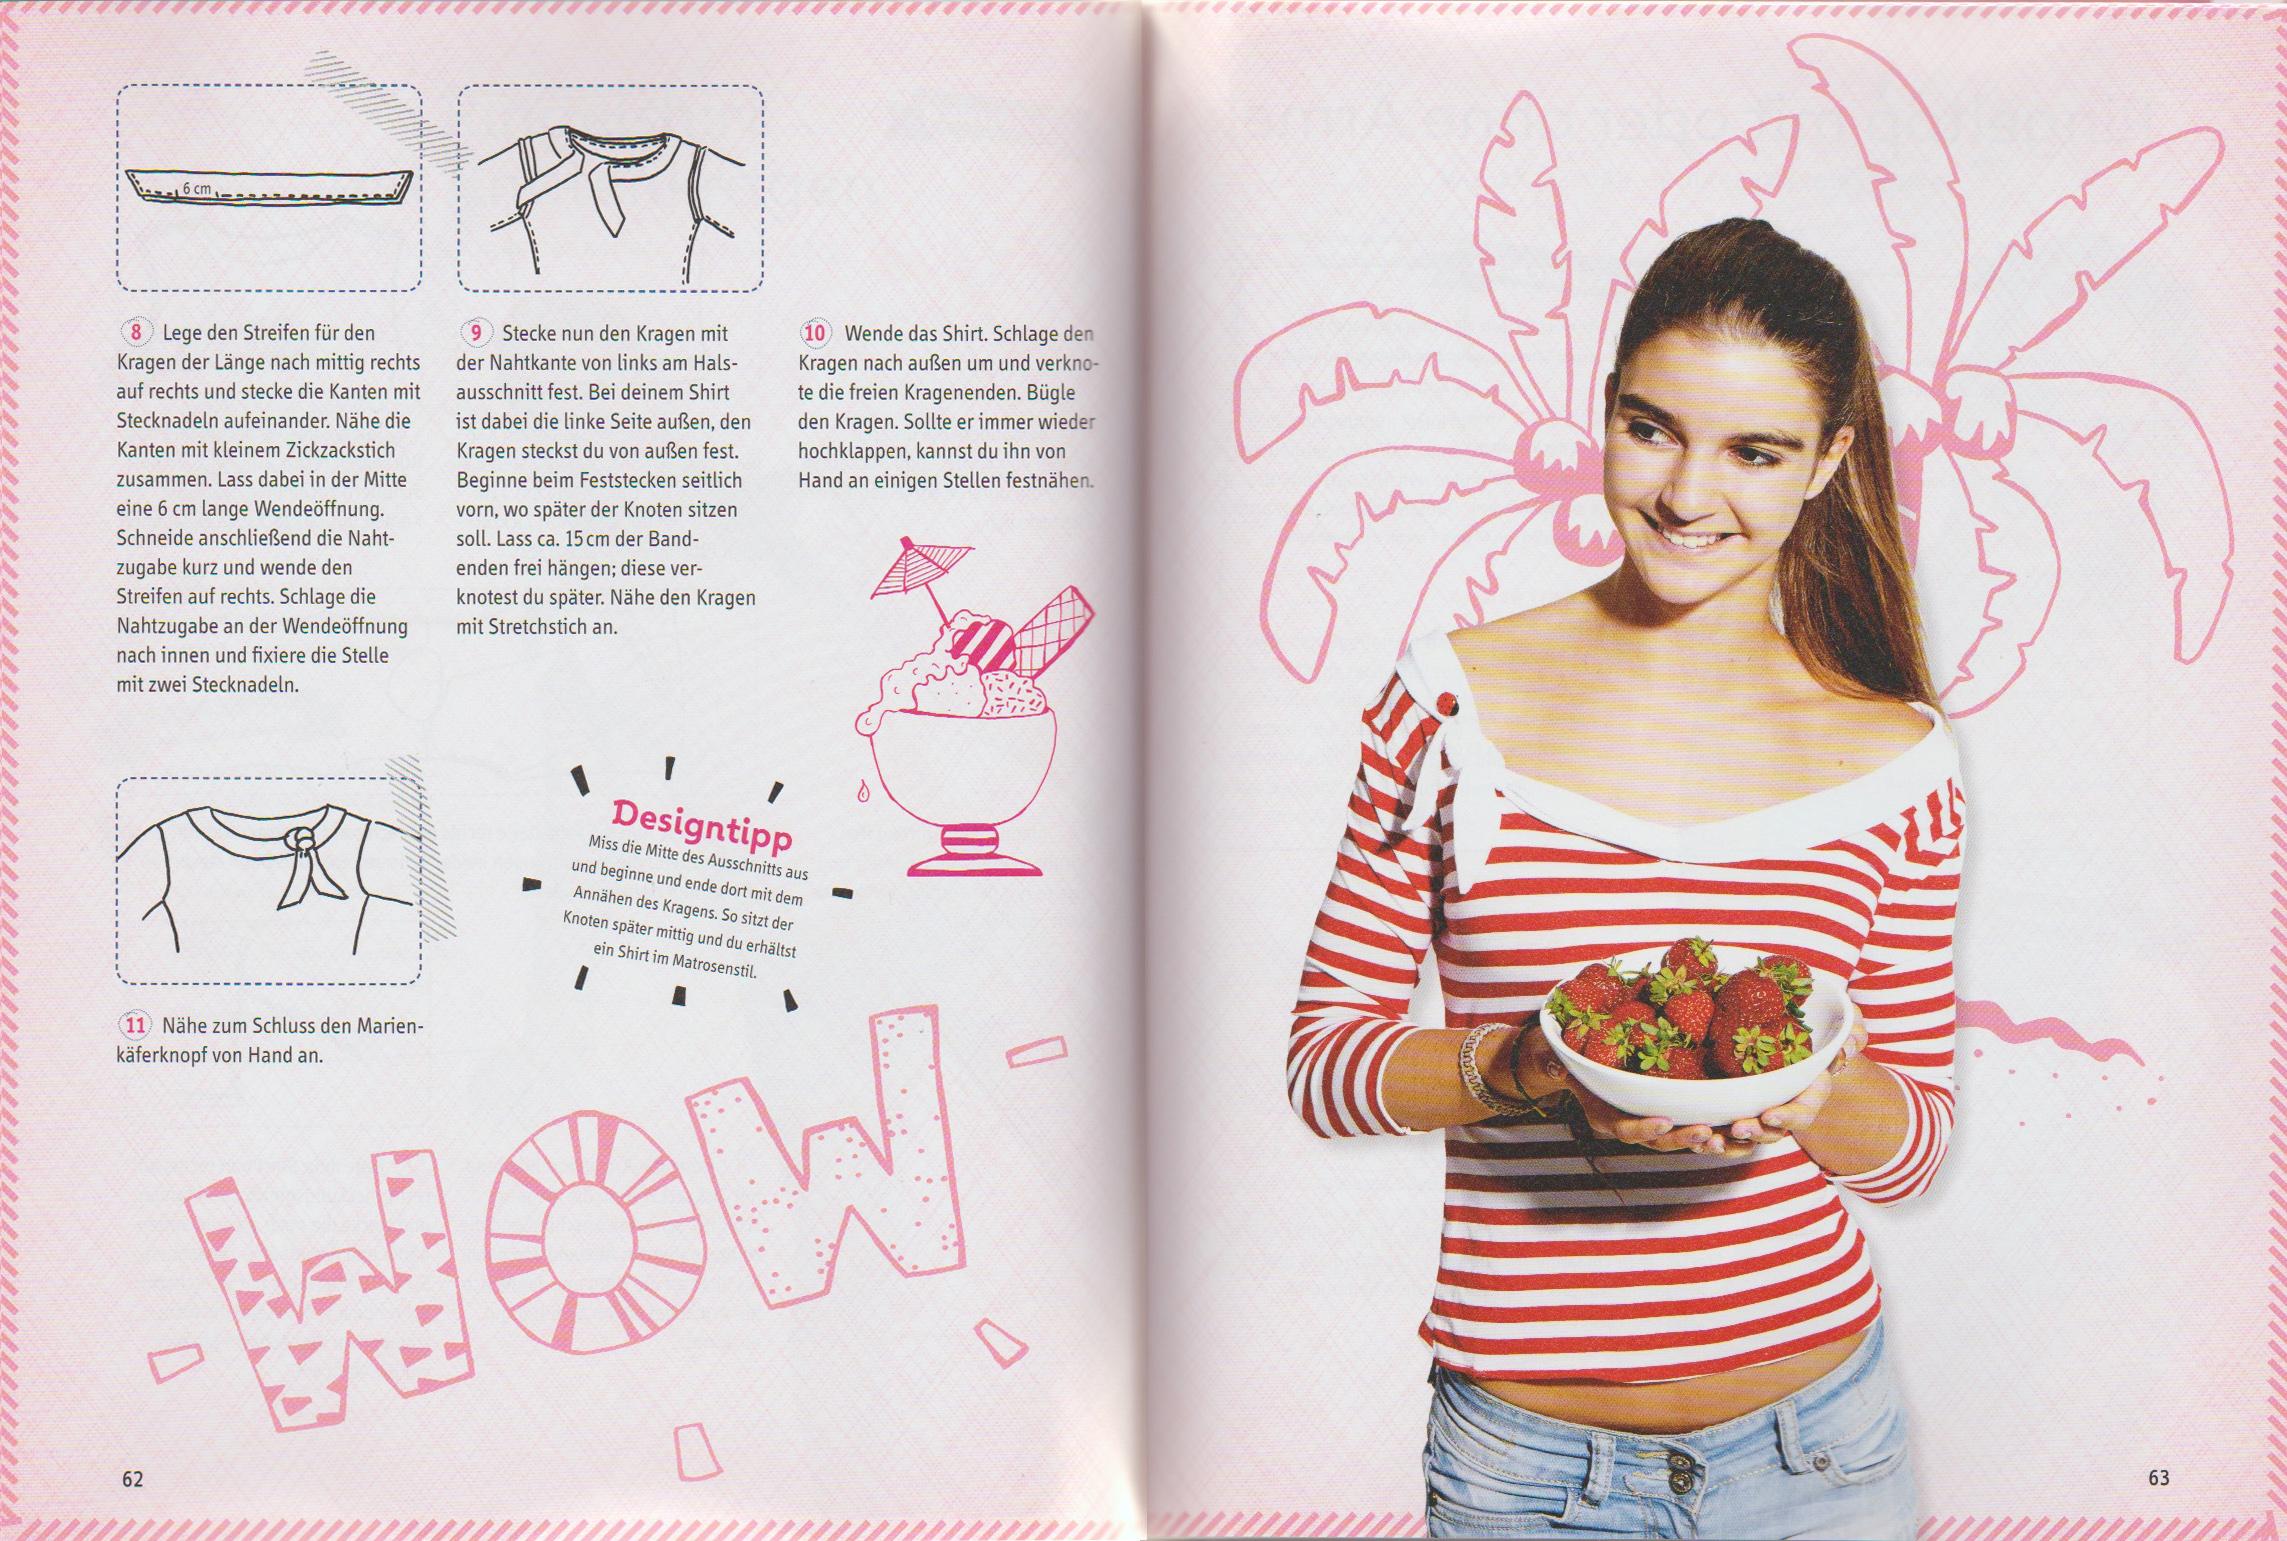 frechverlag_fashionbuch_fj15_04.jpg